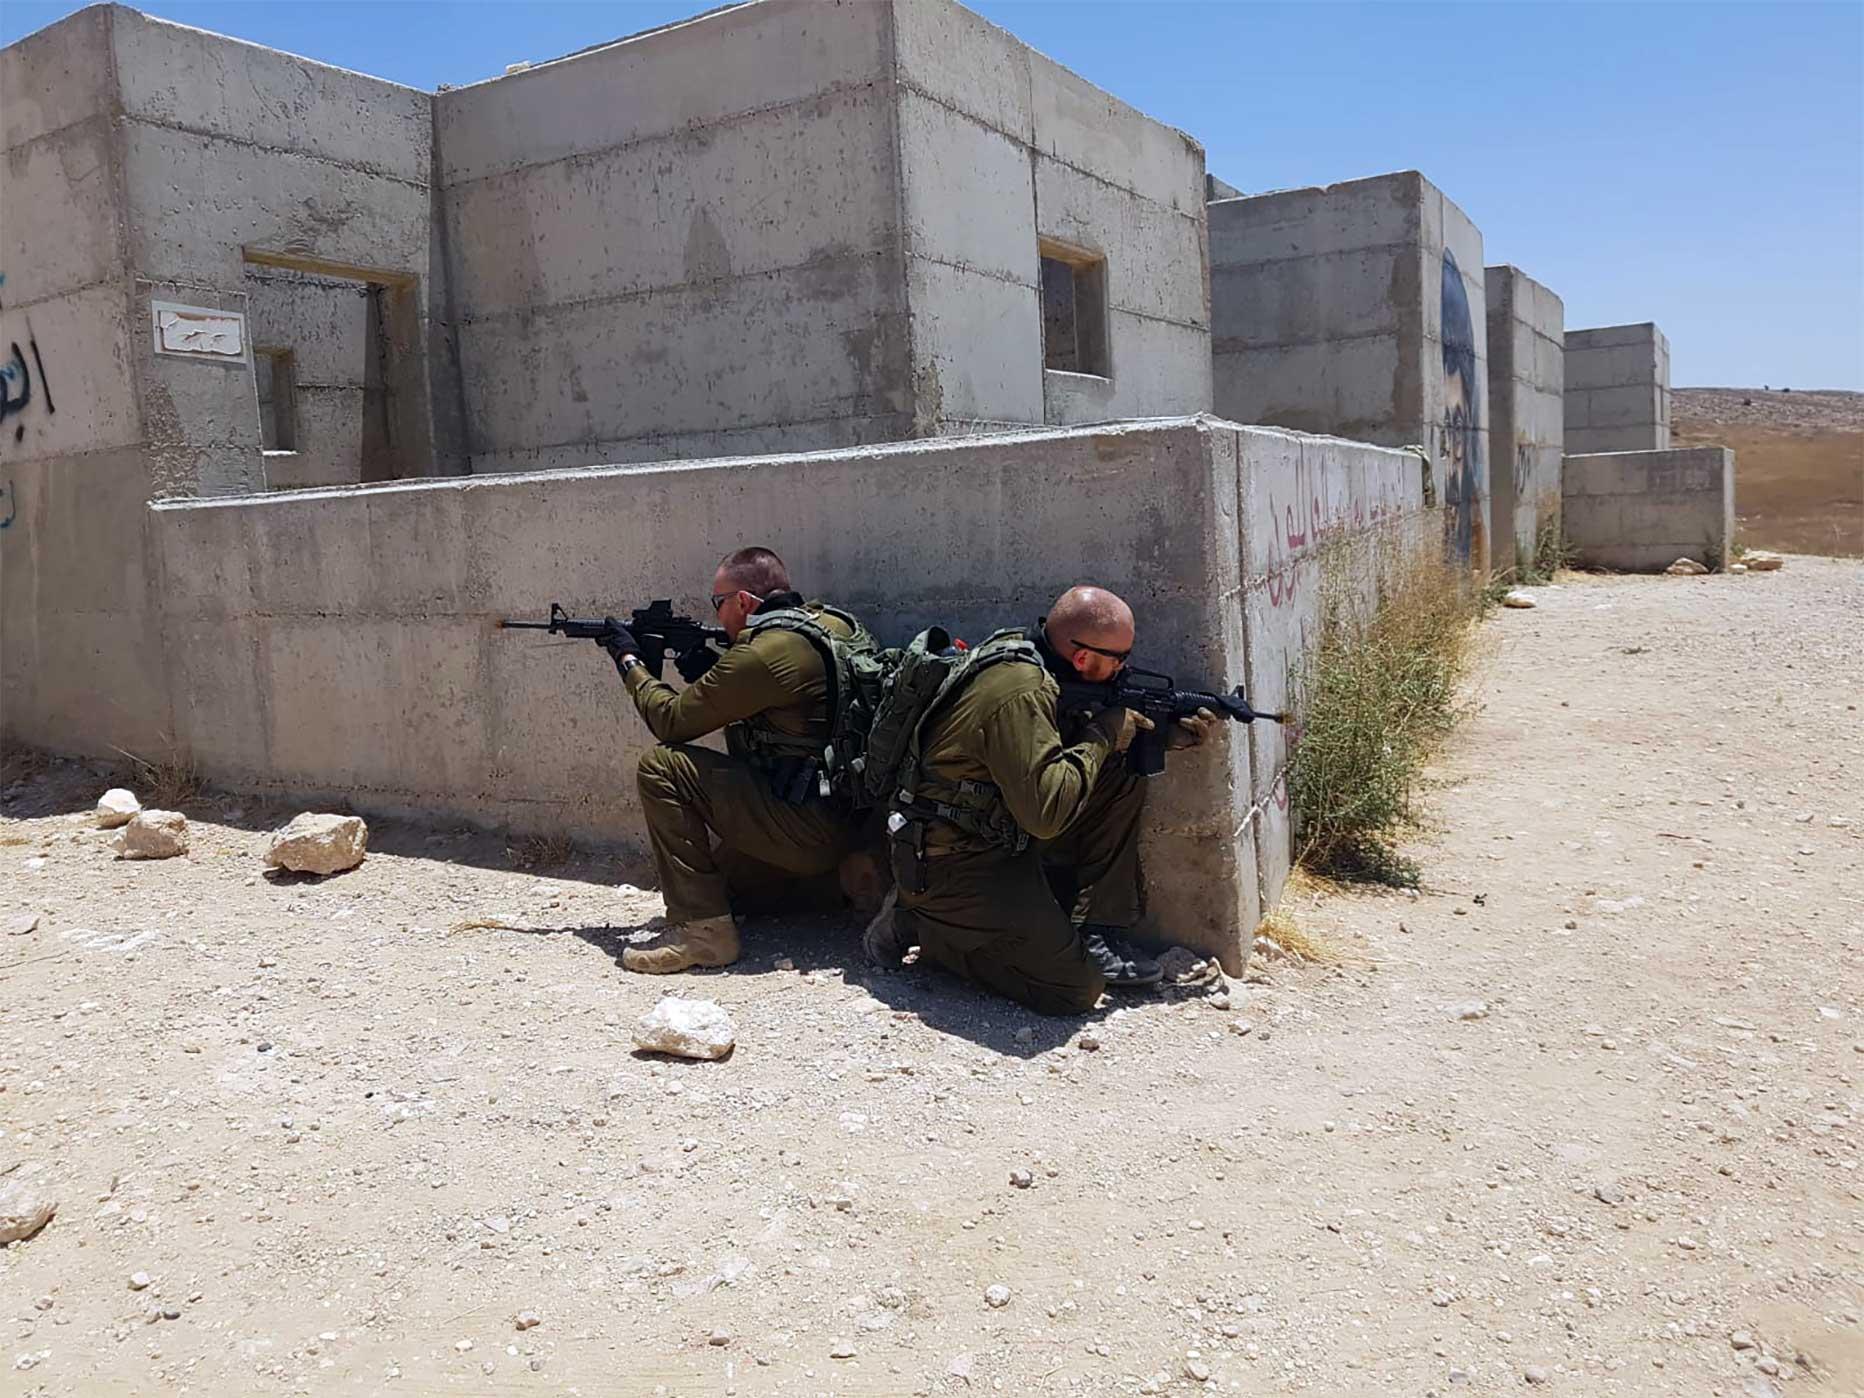 manuel spadaccini e daniele cattaneo addestramento in israele con fucile